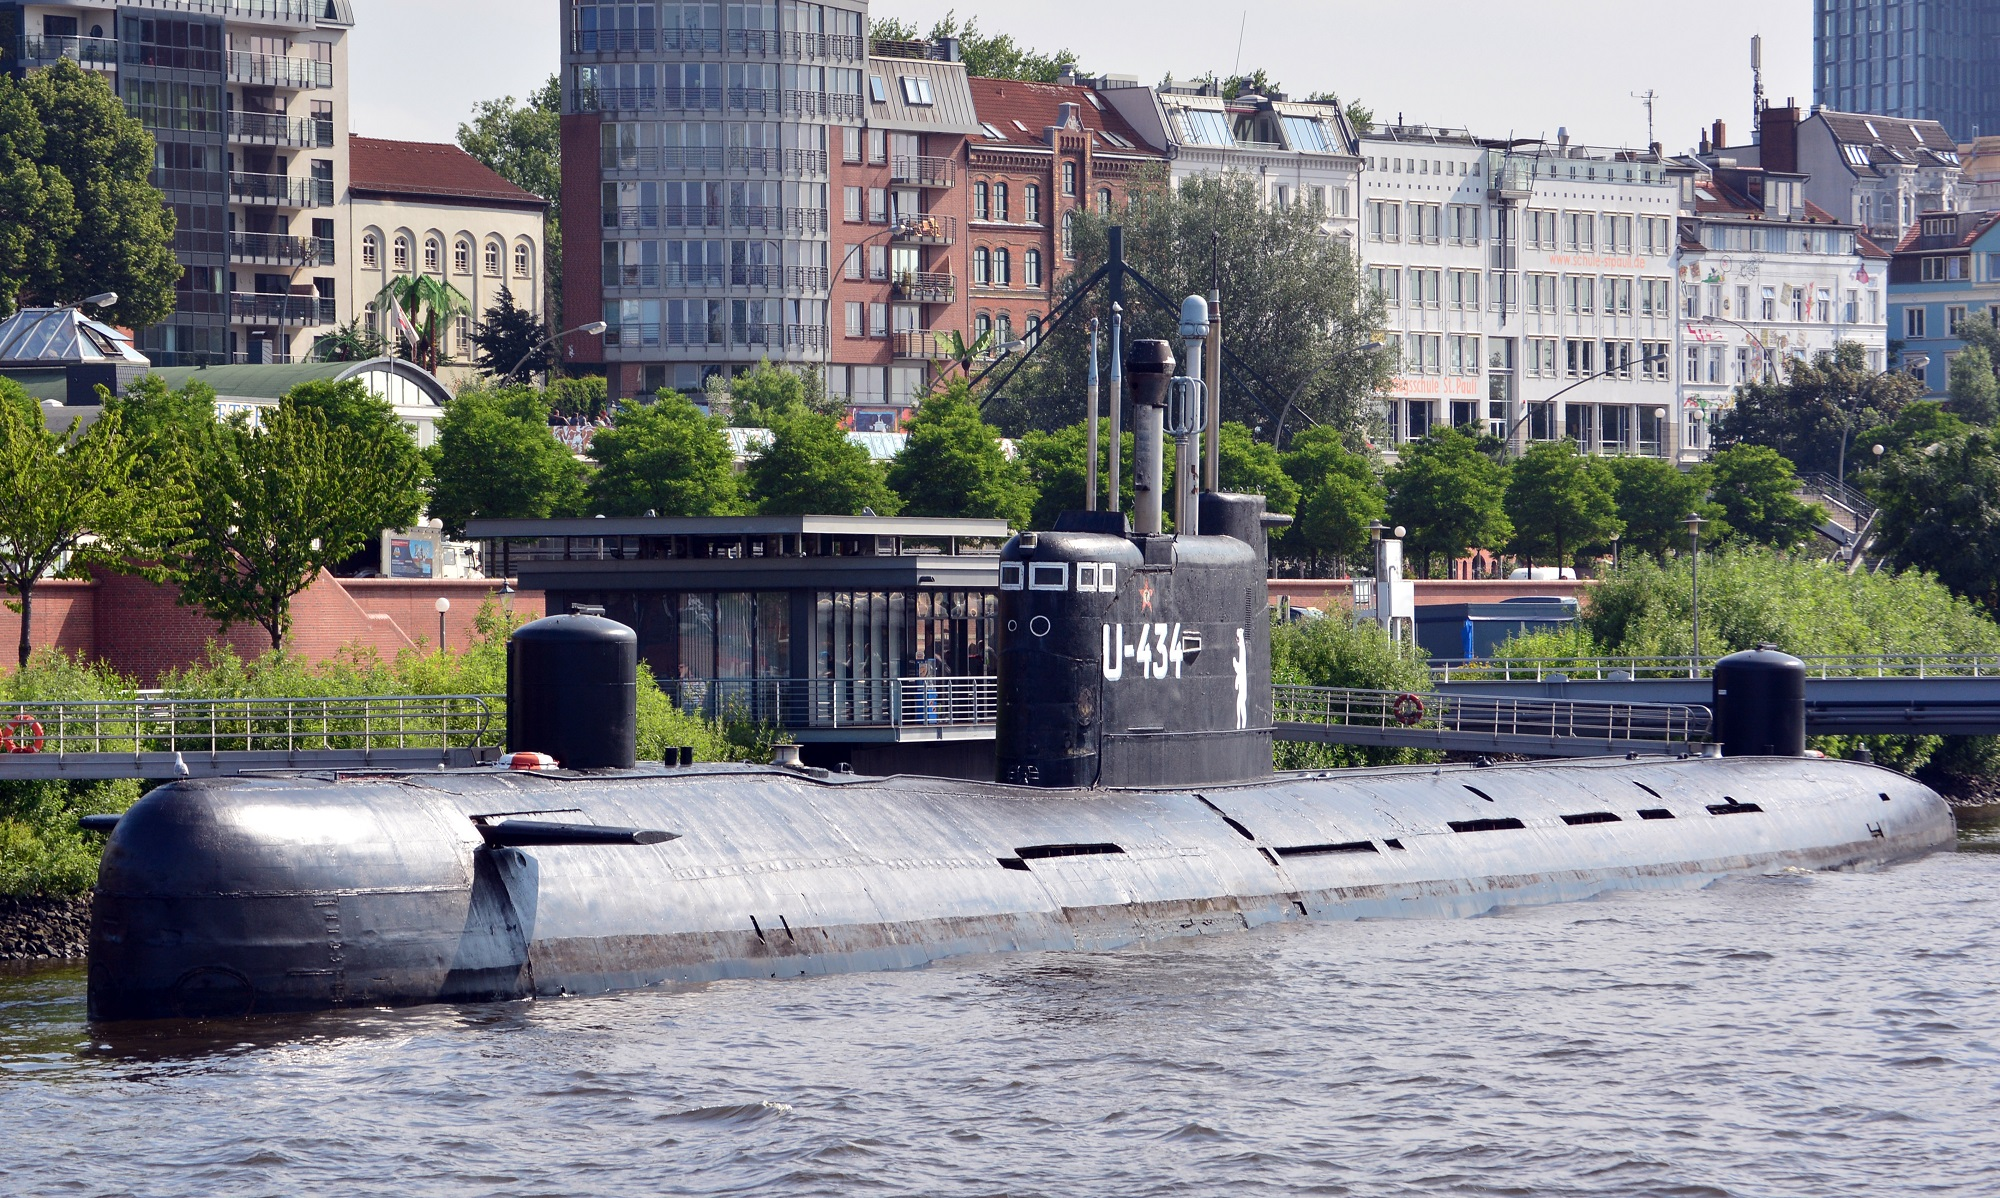 Tango-class submarine U-434/B-515